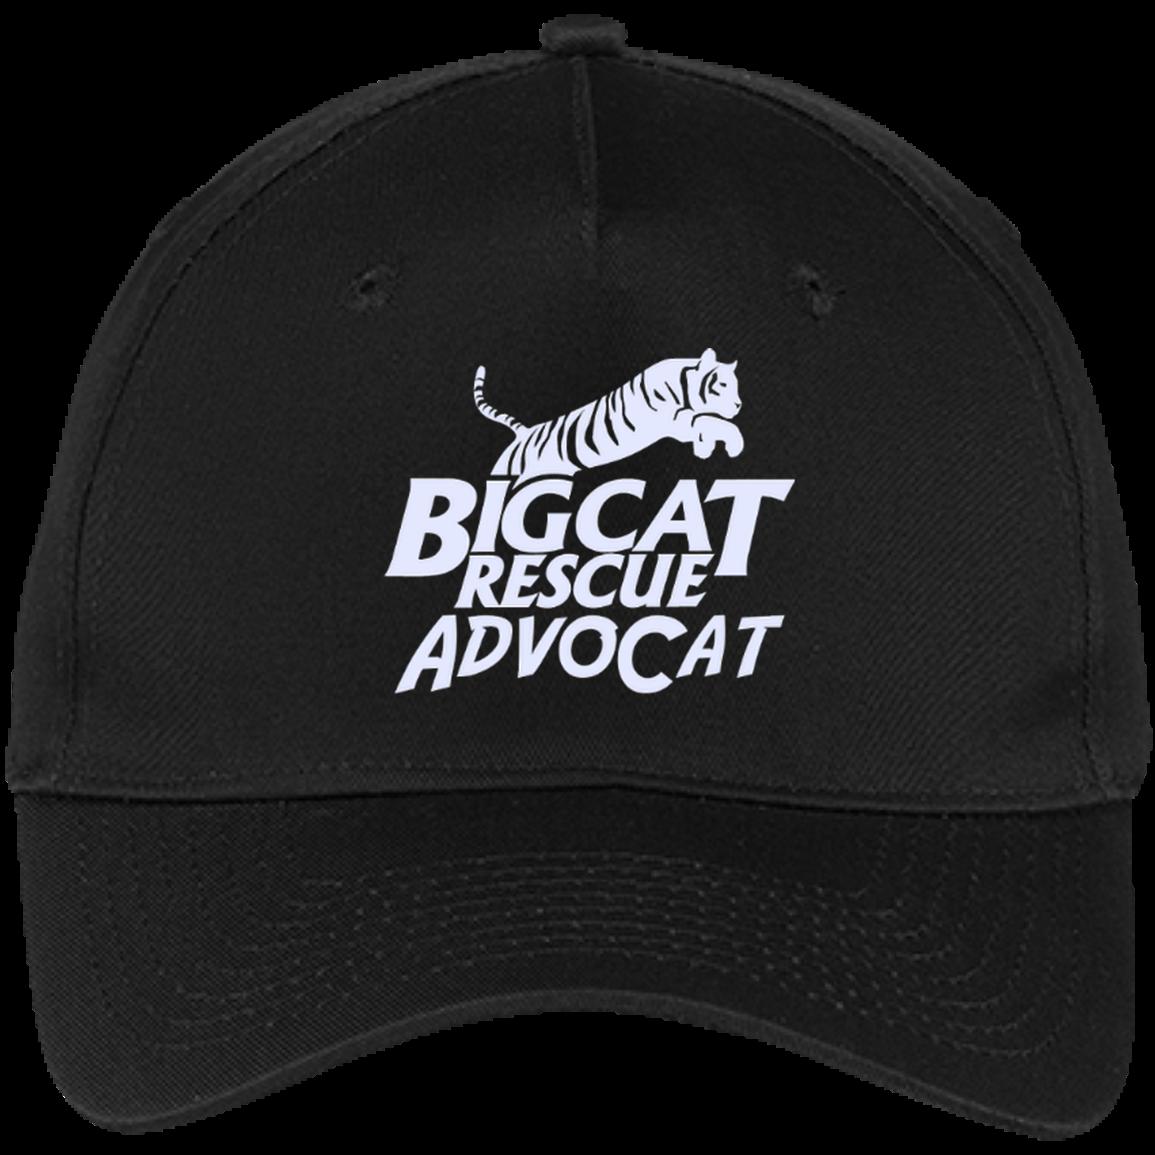 Logo AdvoCat Five Panel Twill Cap Twill, Cap, Cotton twill